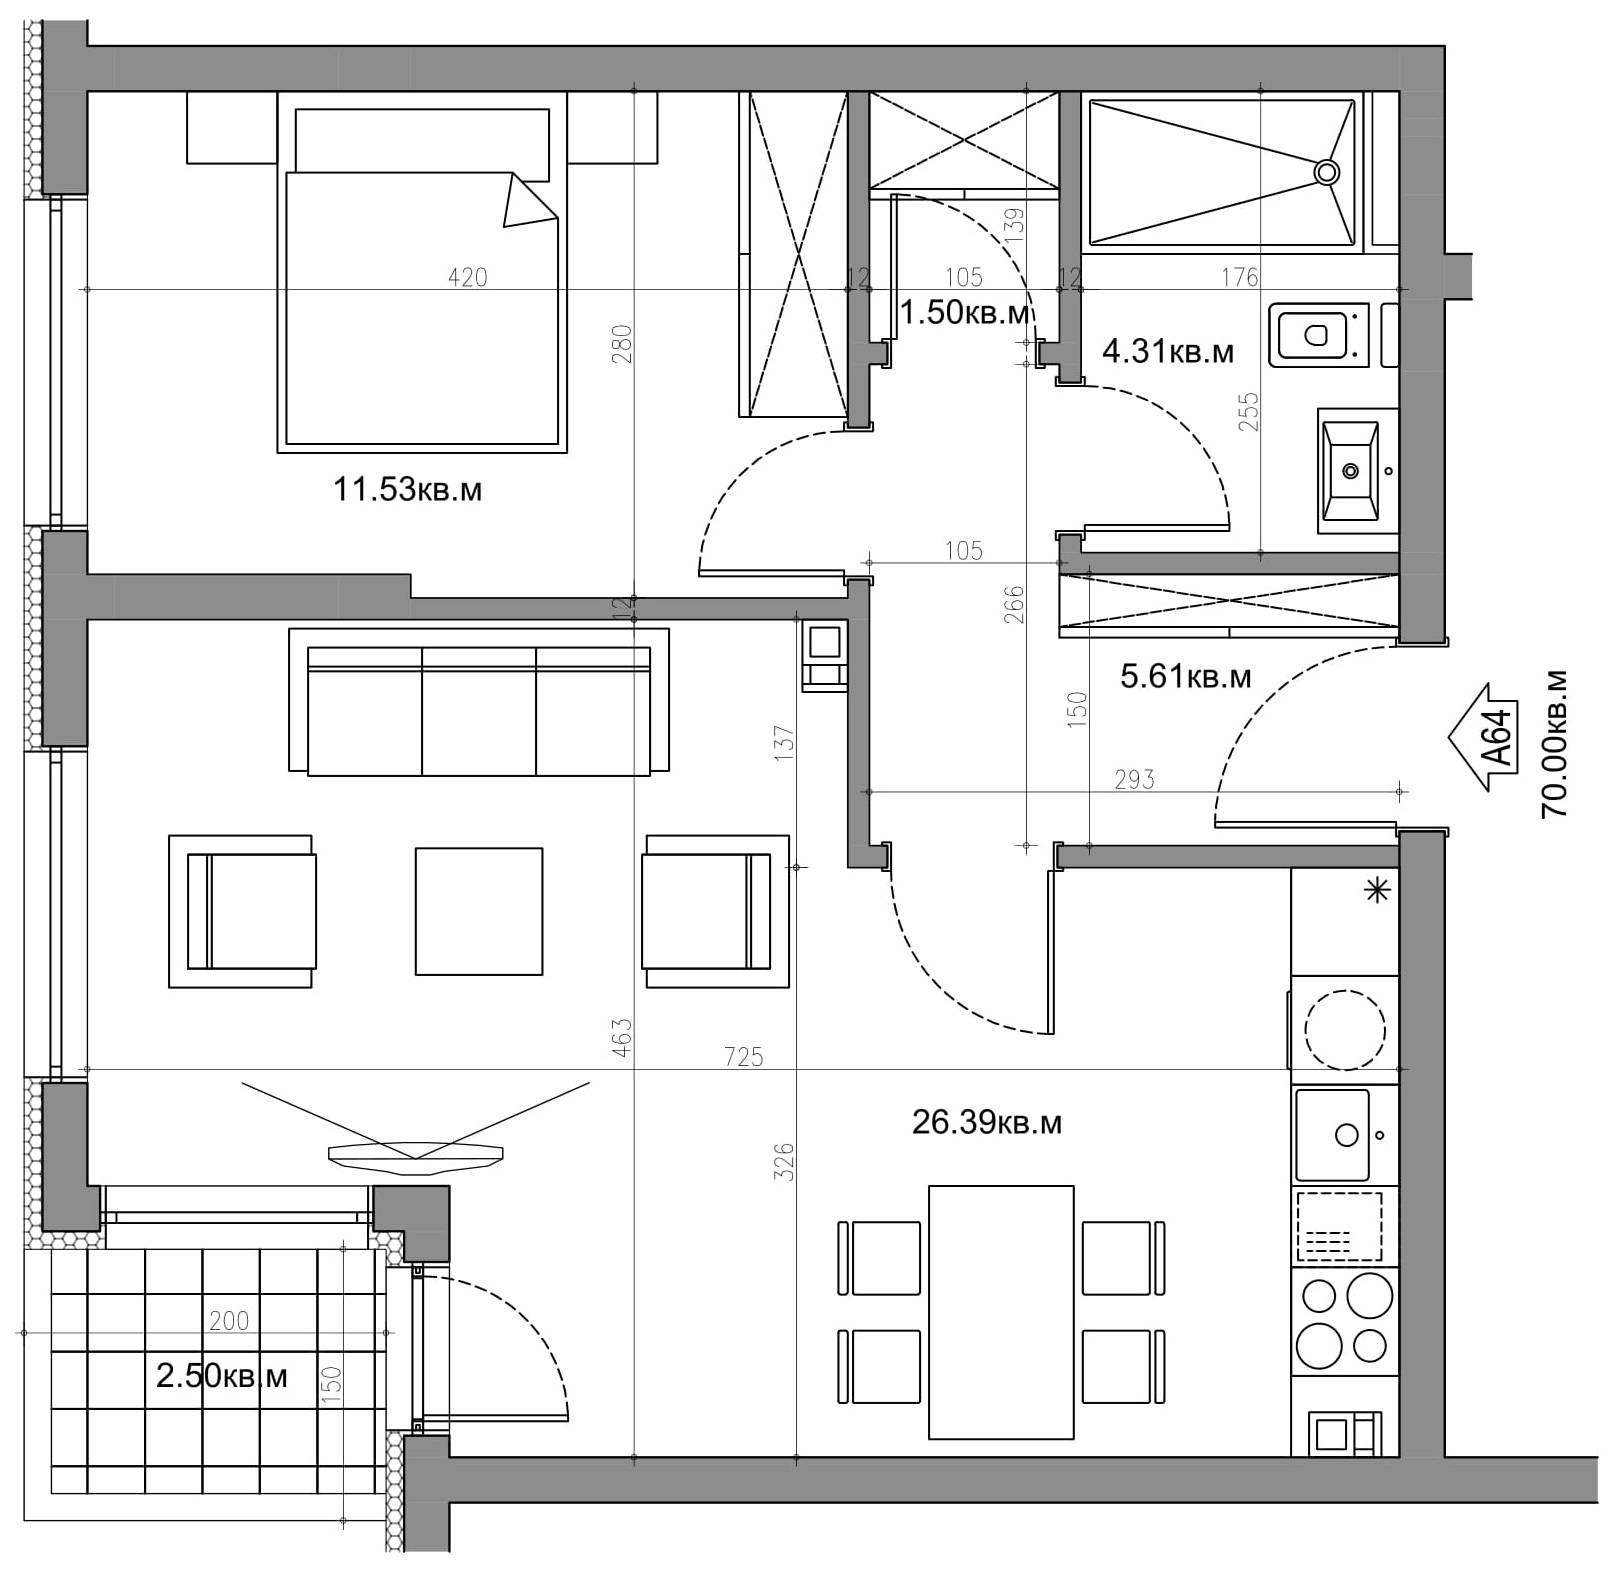 Vinitsa_Apartment_3_64